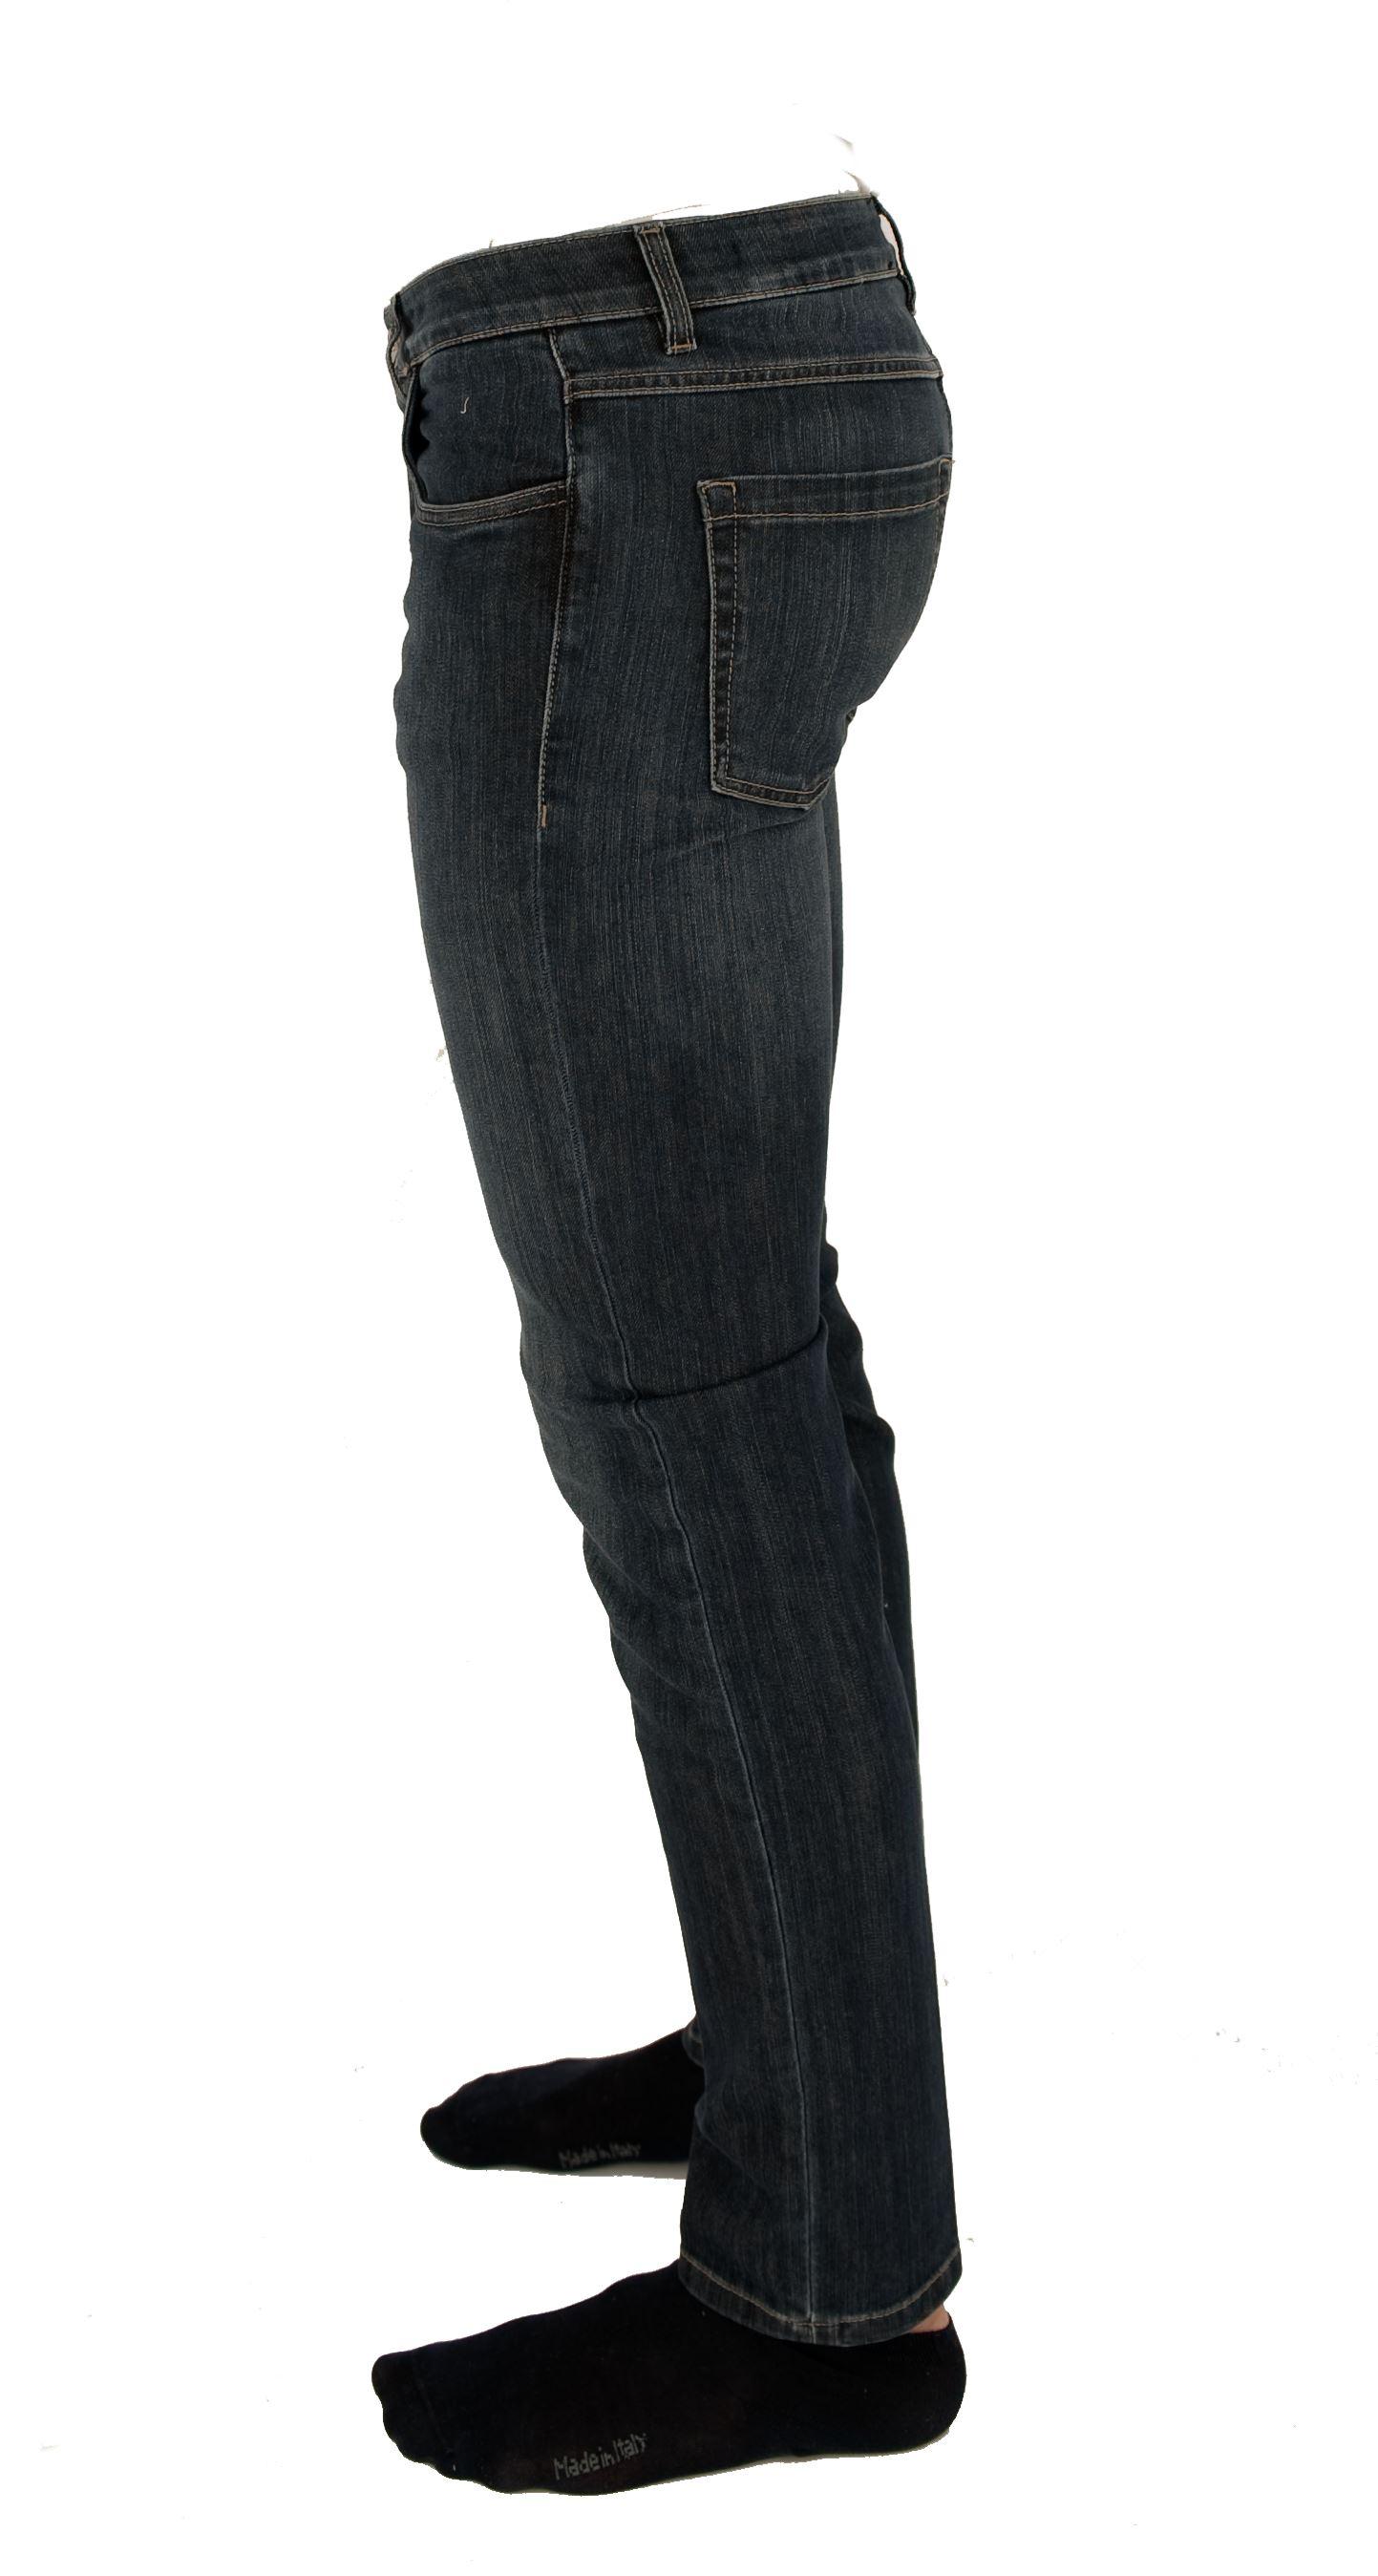 0912ca03466d CAMOUFLAGE 5 pocket jeans bs better 18 blue Regular updated fit ...